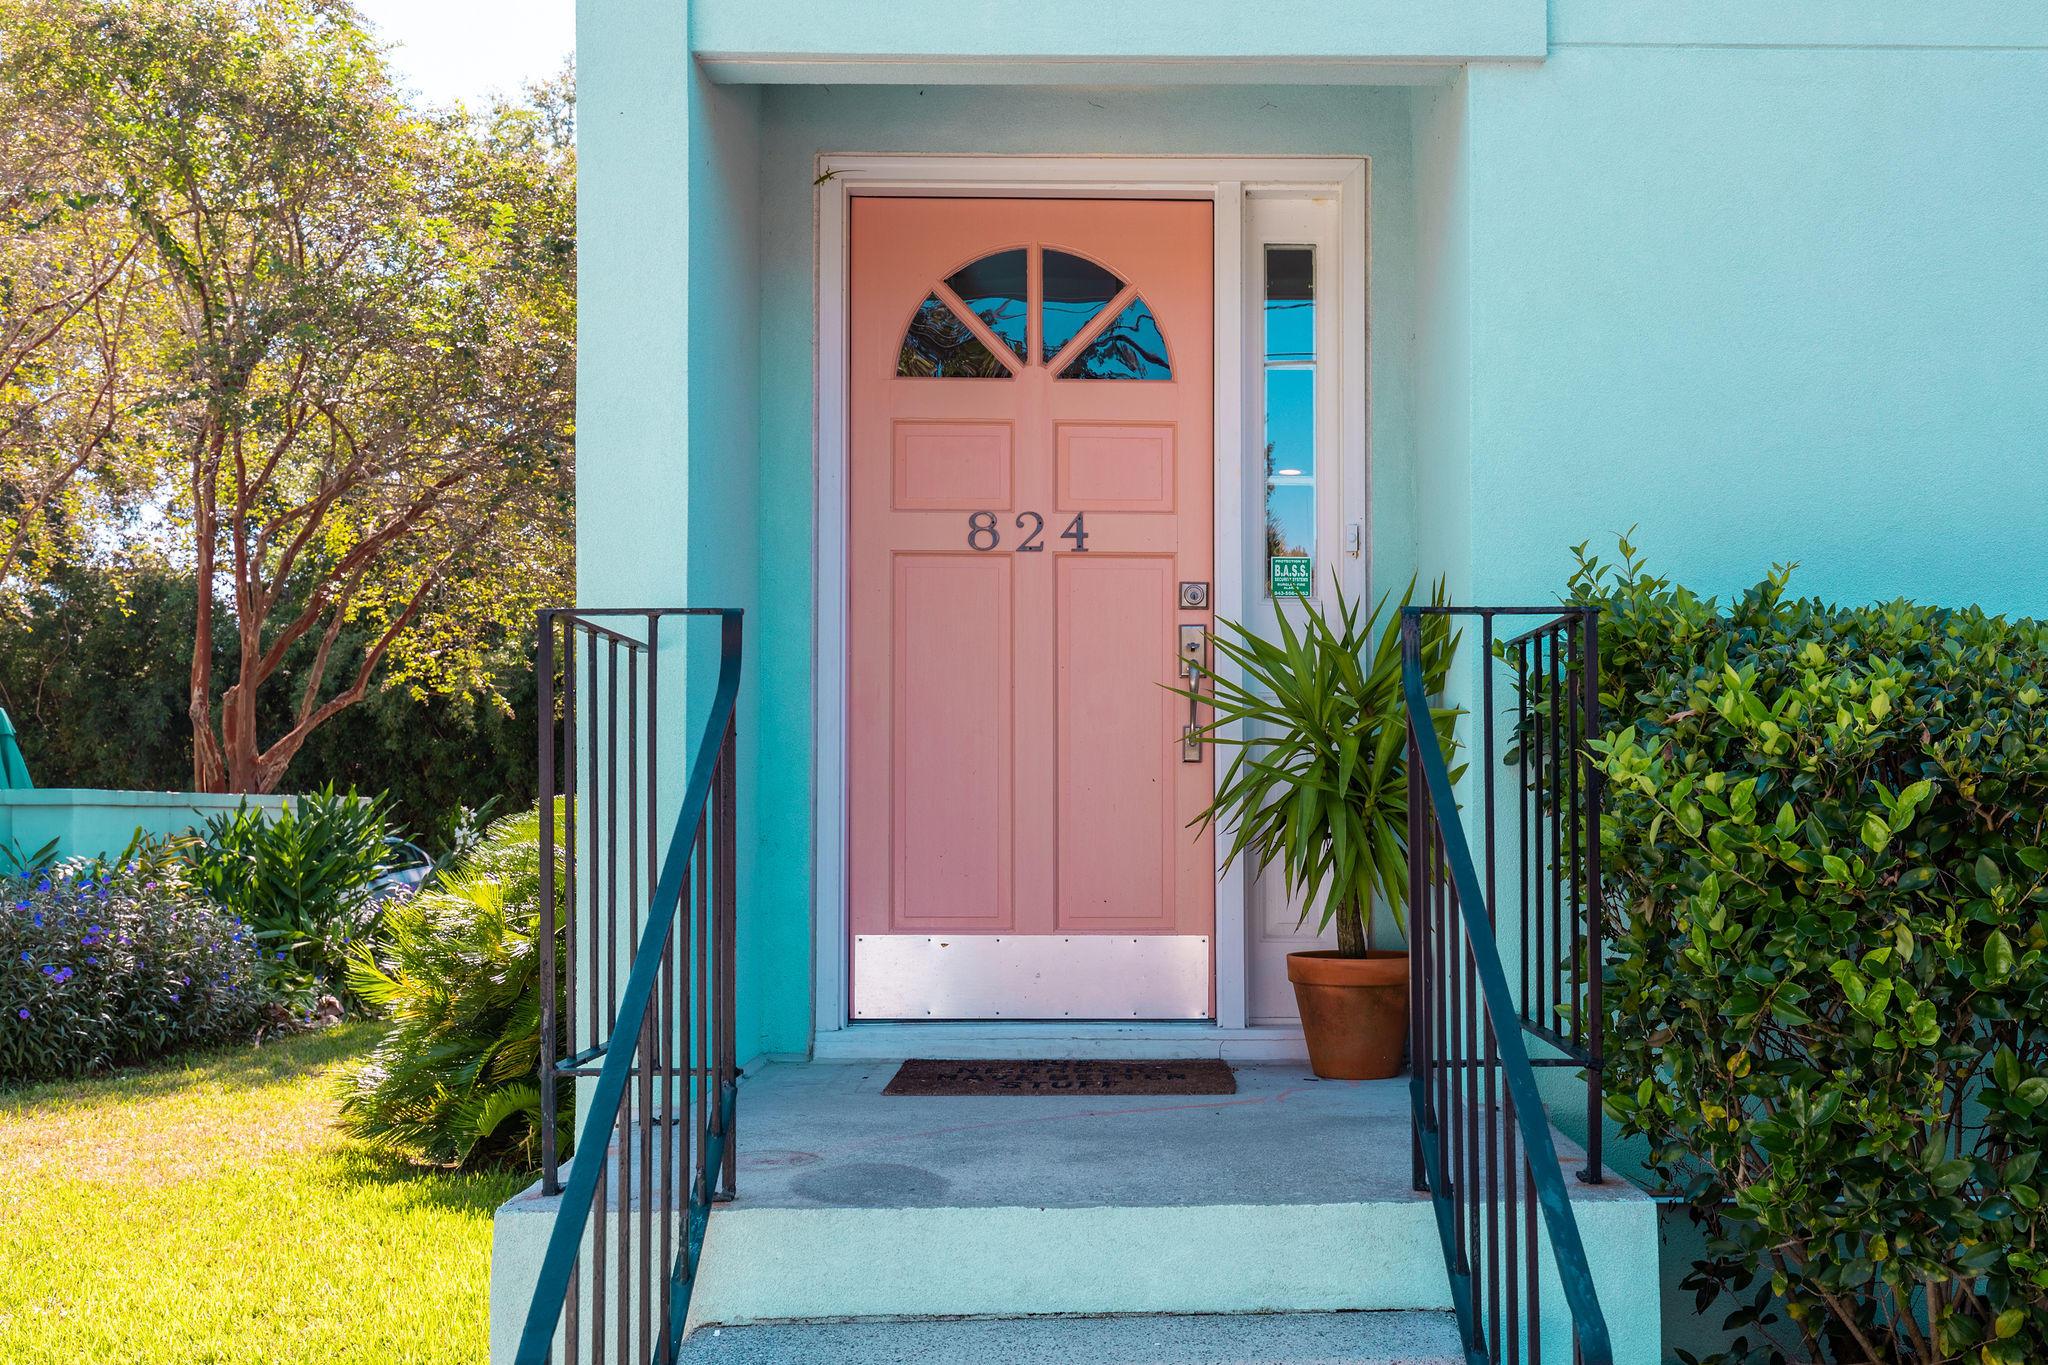 Proprietors Row Homes For Sale - 824 Colony, Charleston, SC - 17